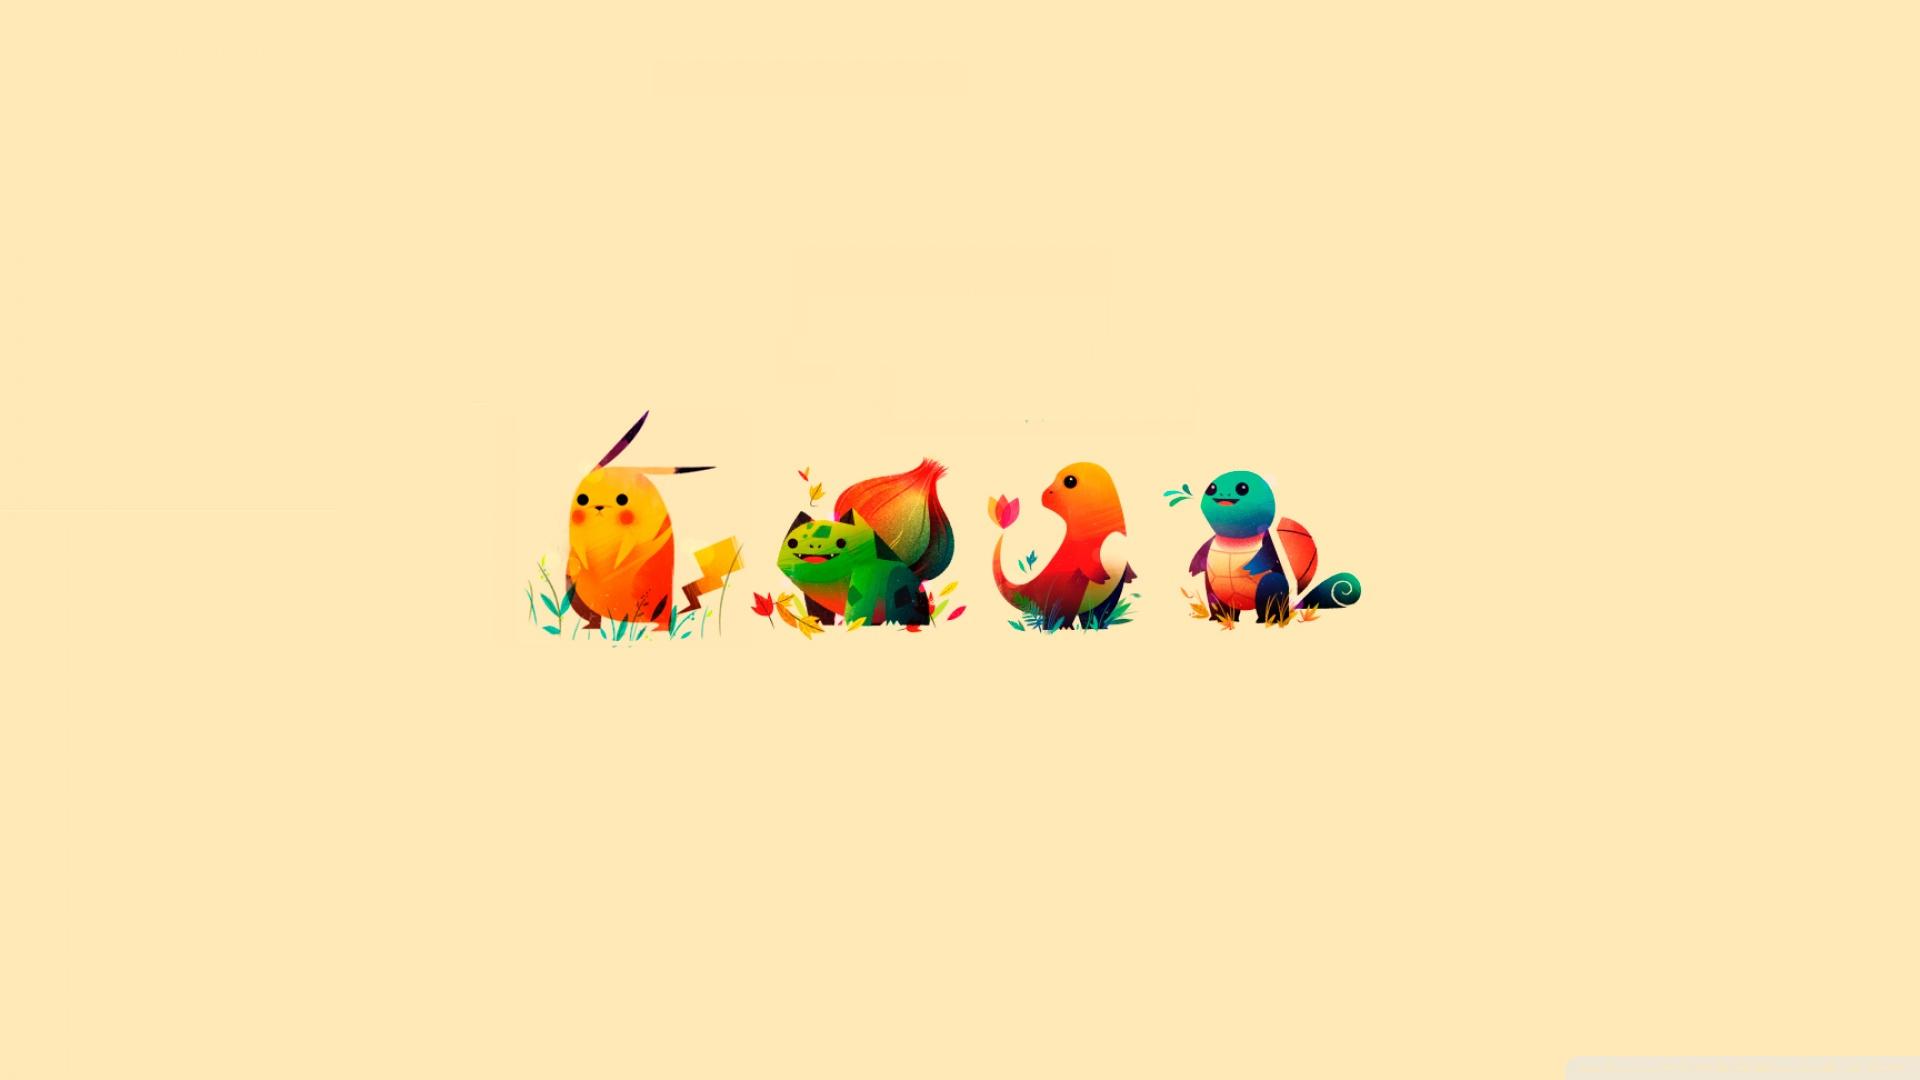 Pikachu Charmander Squirtle Wallpaper 1920x1080 Wallpoper 444602 1920x1080